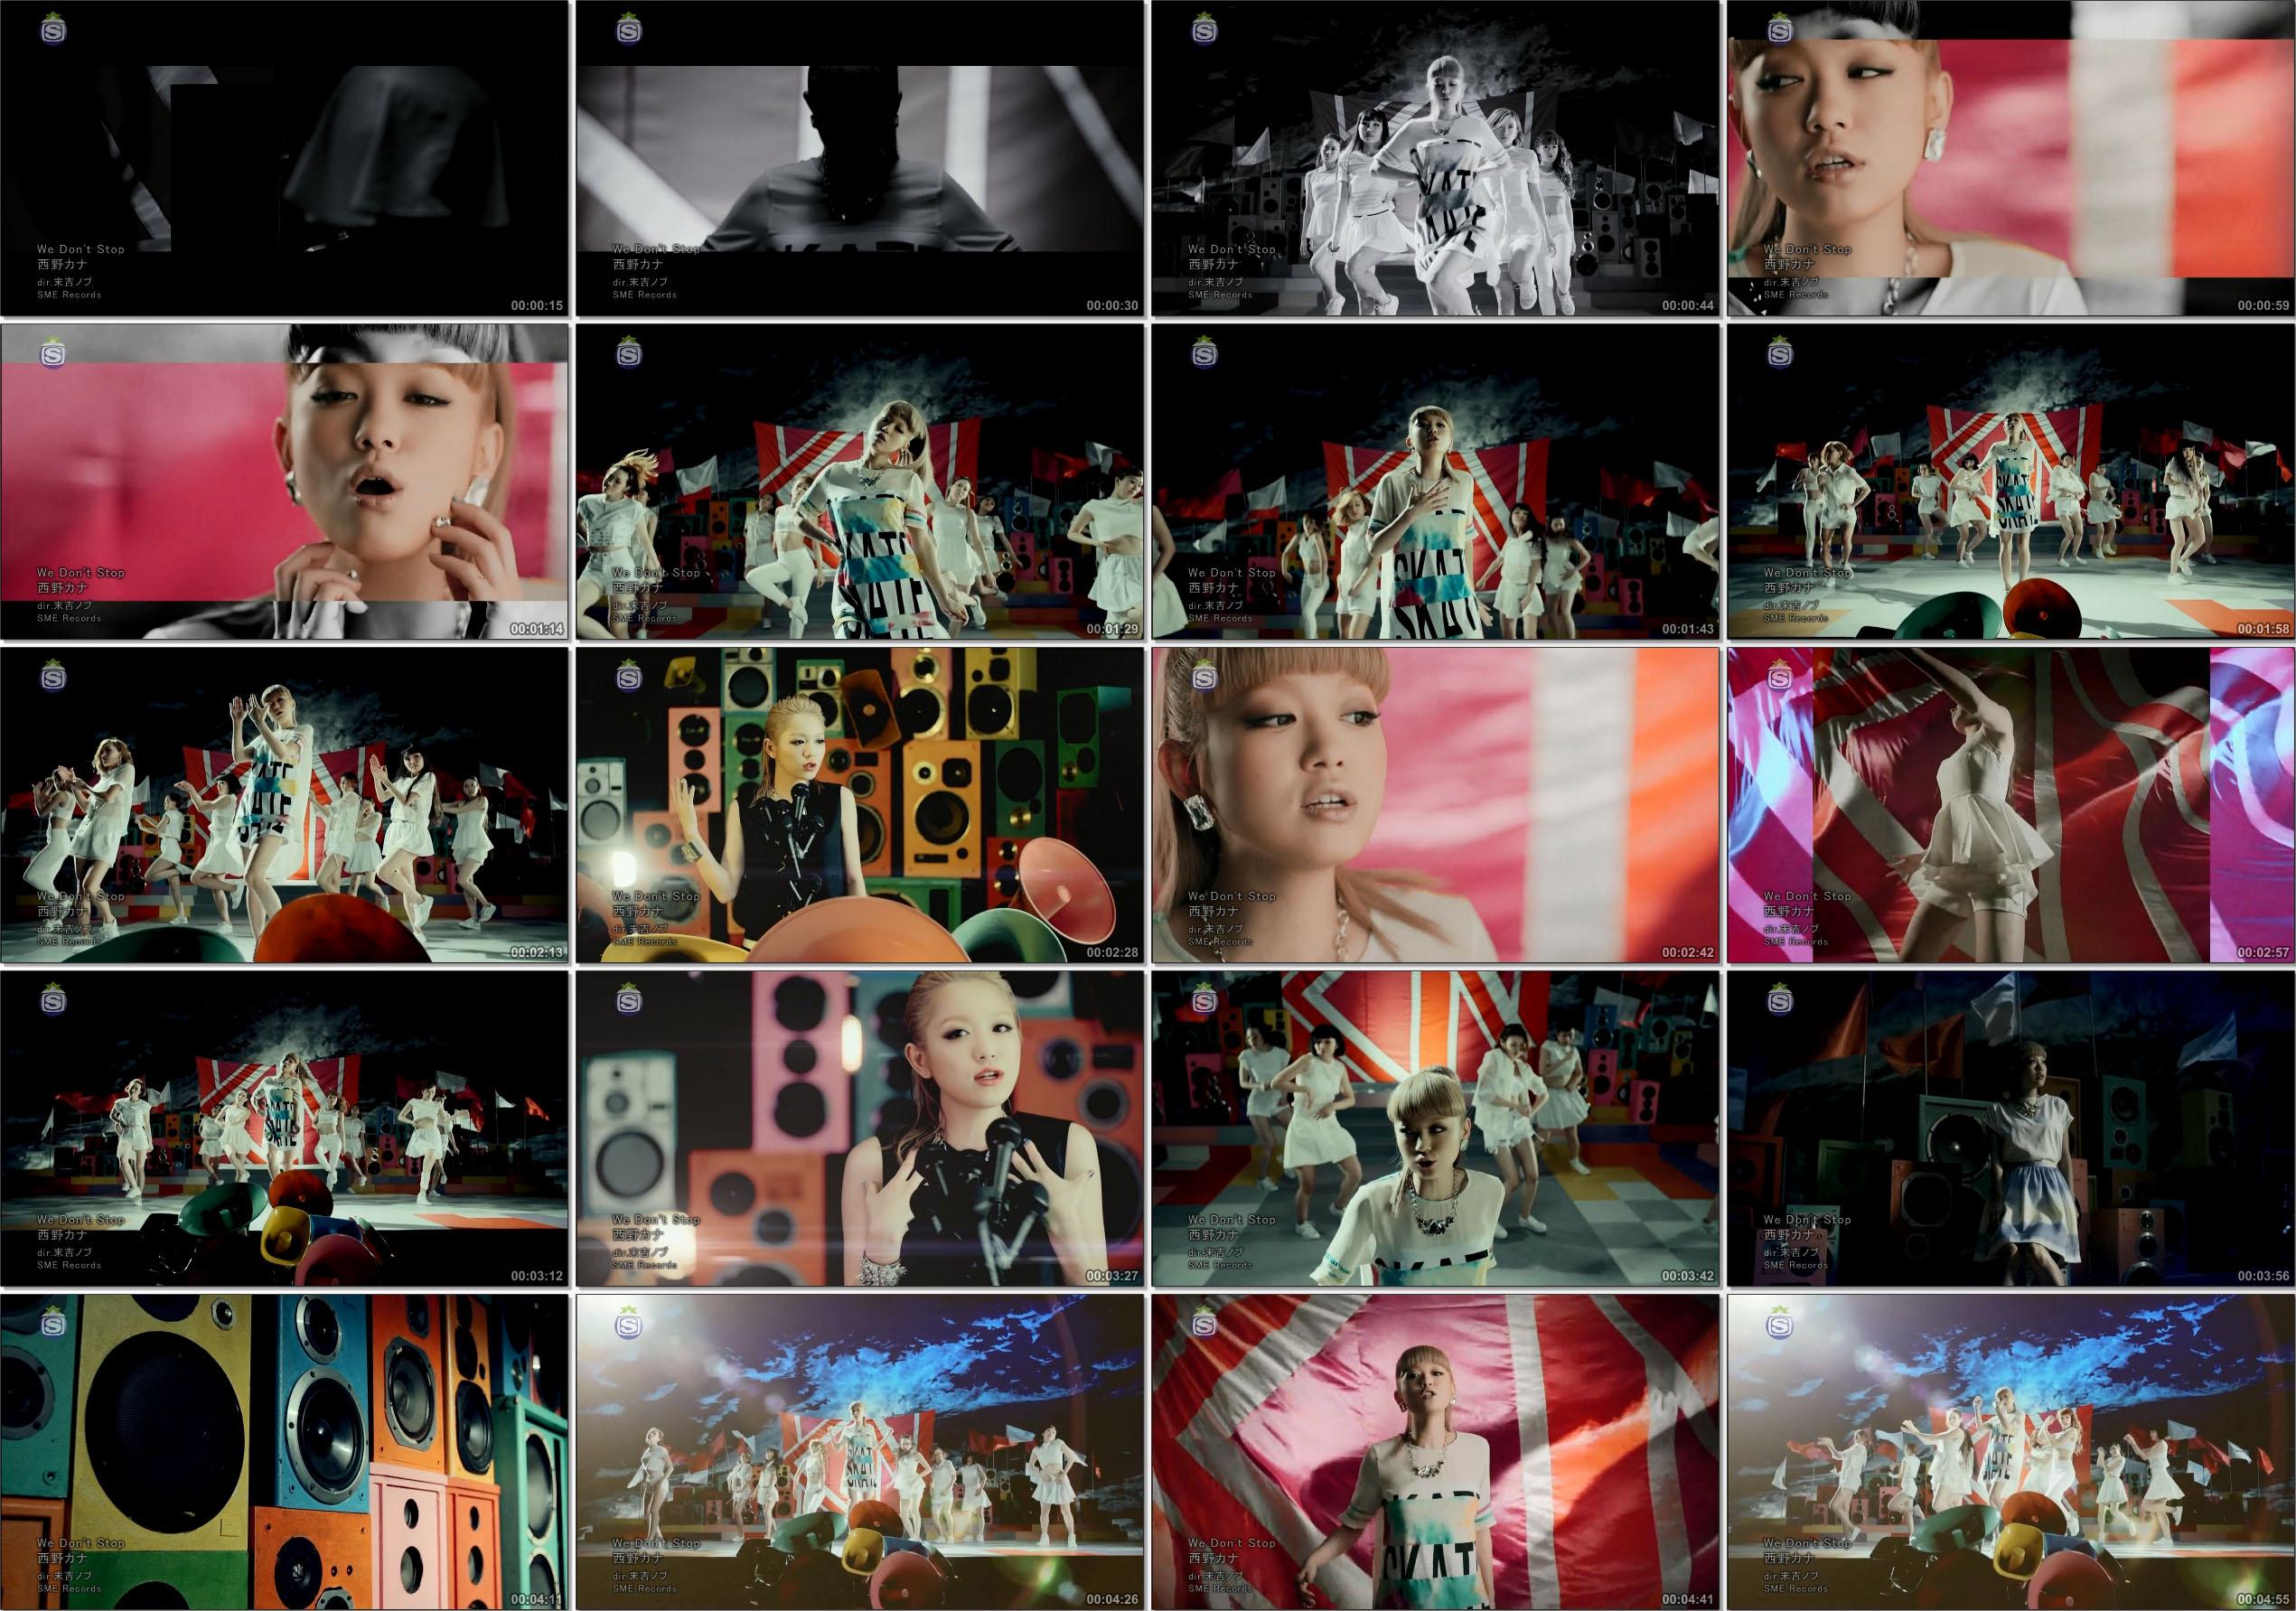 Kana Nishino - We Don't Stop [2014.05.21]